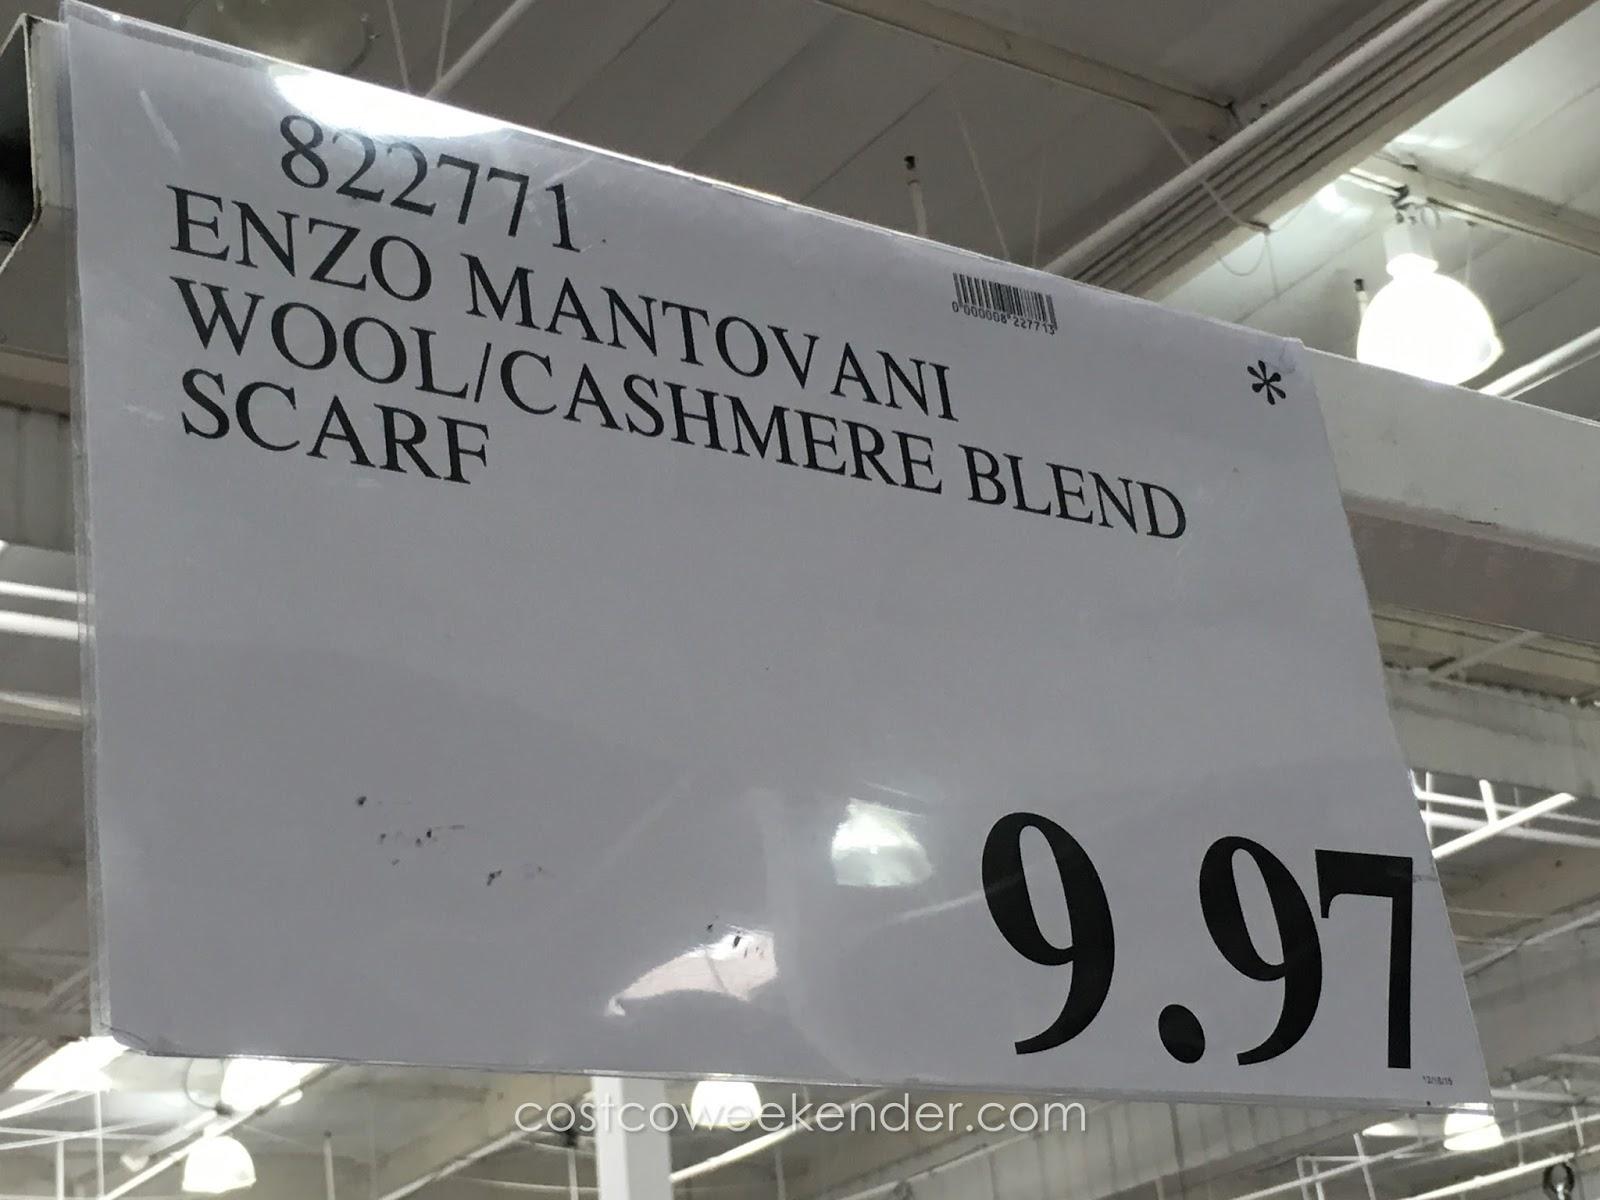 Enzo mantovani wool cashmere blend scarf costco weekender for Enzo mantovani